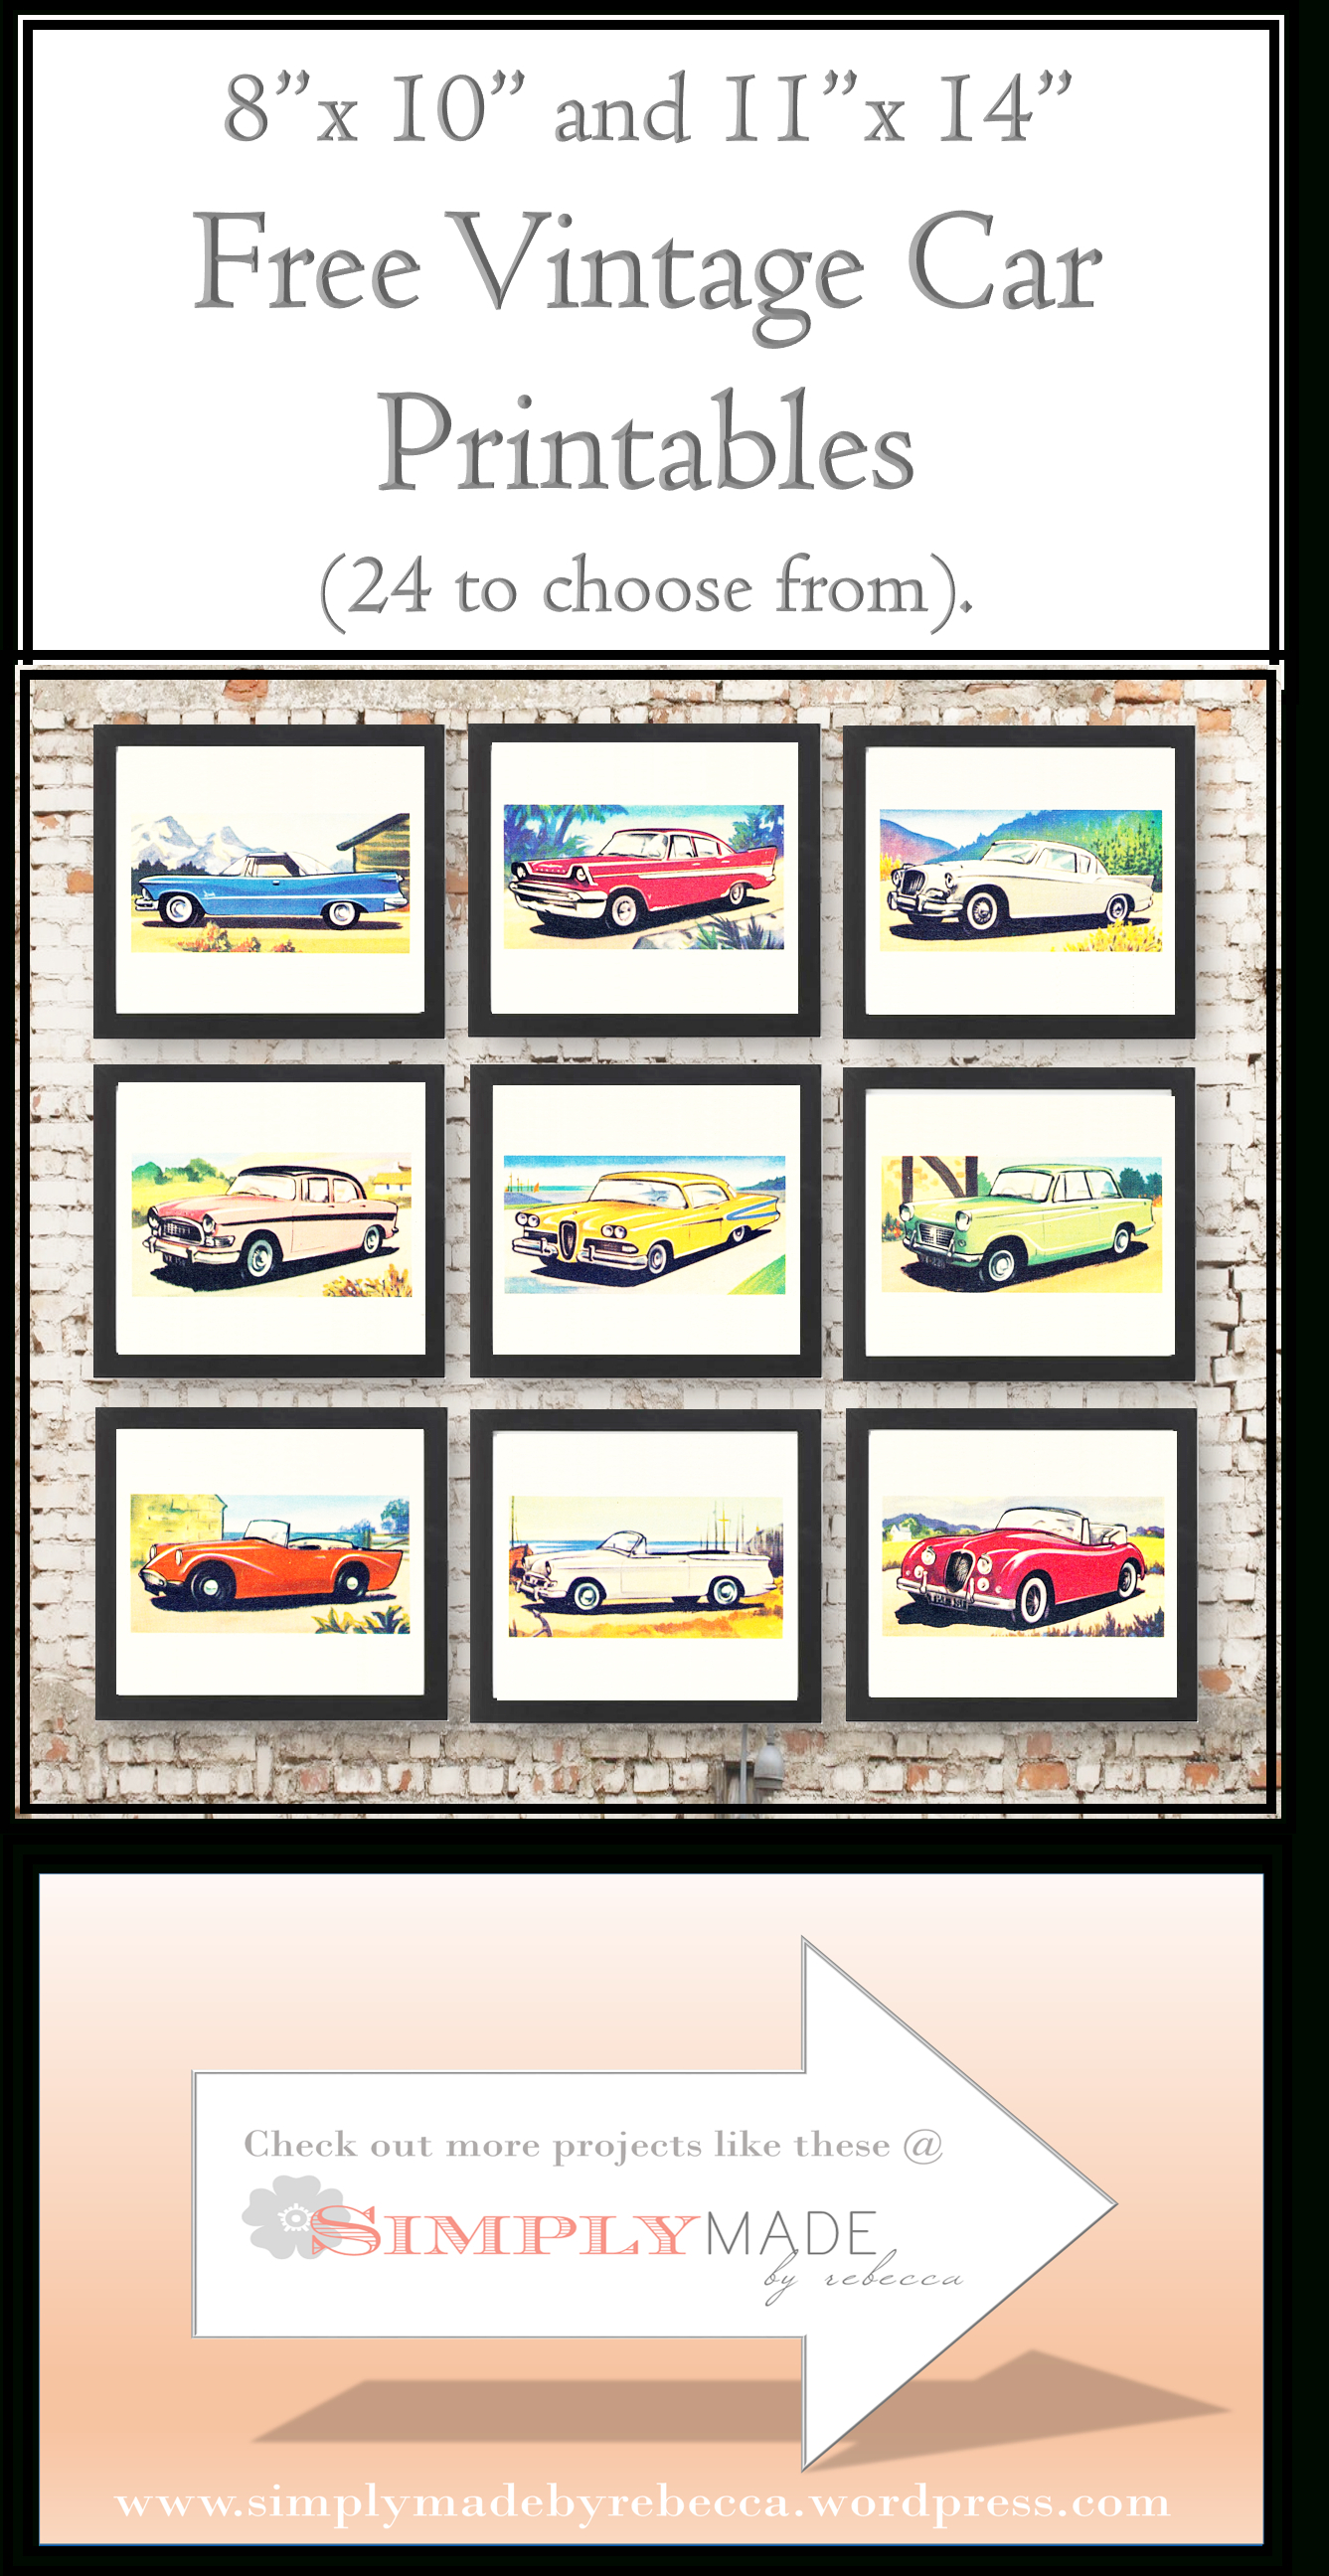 Free Vintage Car Printables | Cards - Downloadable Resources - Free - Free Printable Nursery Resources